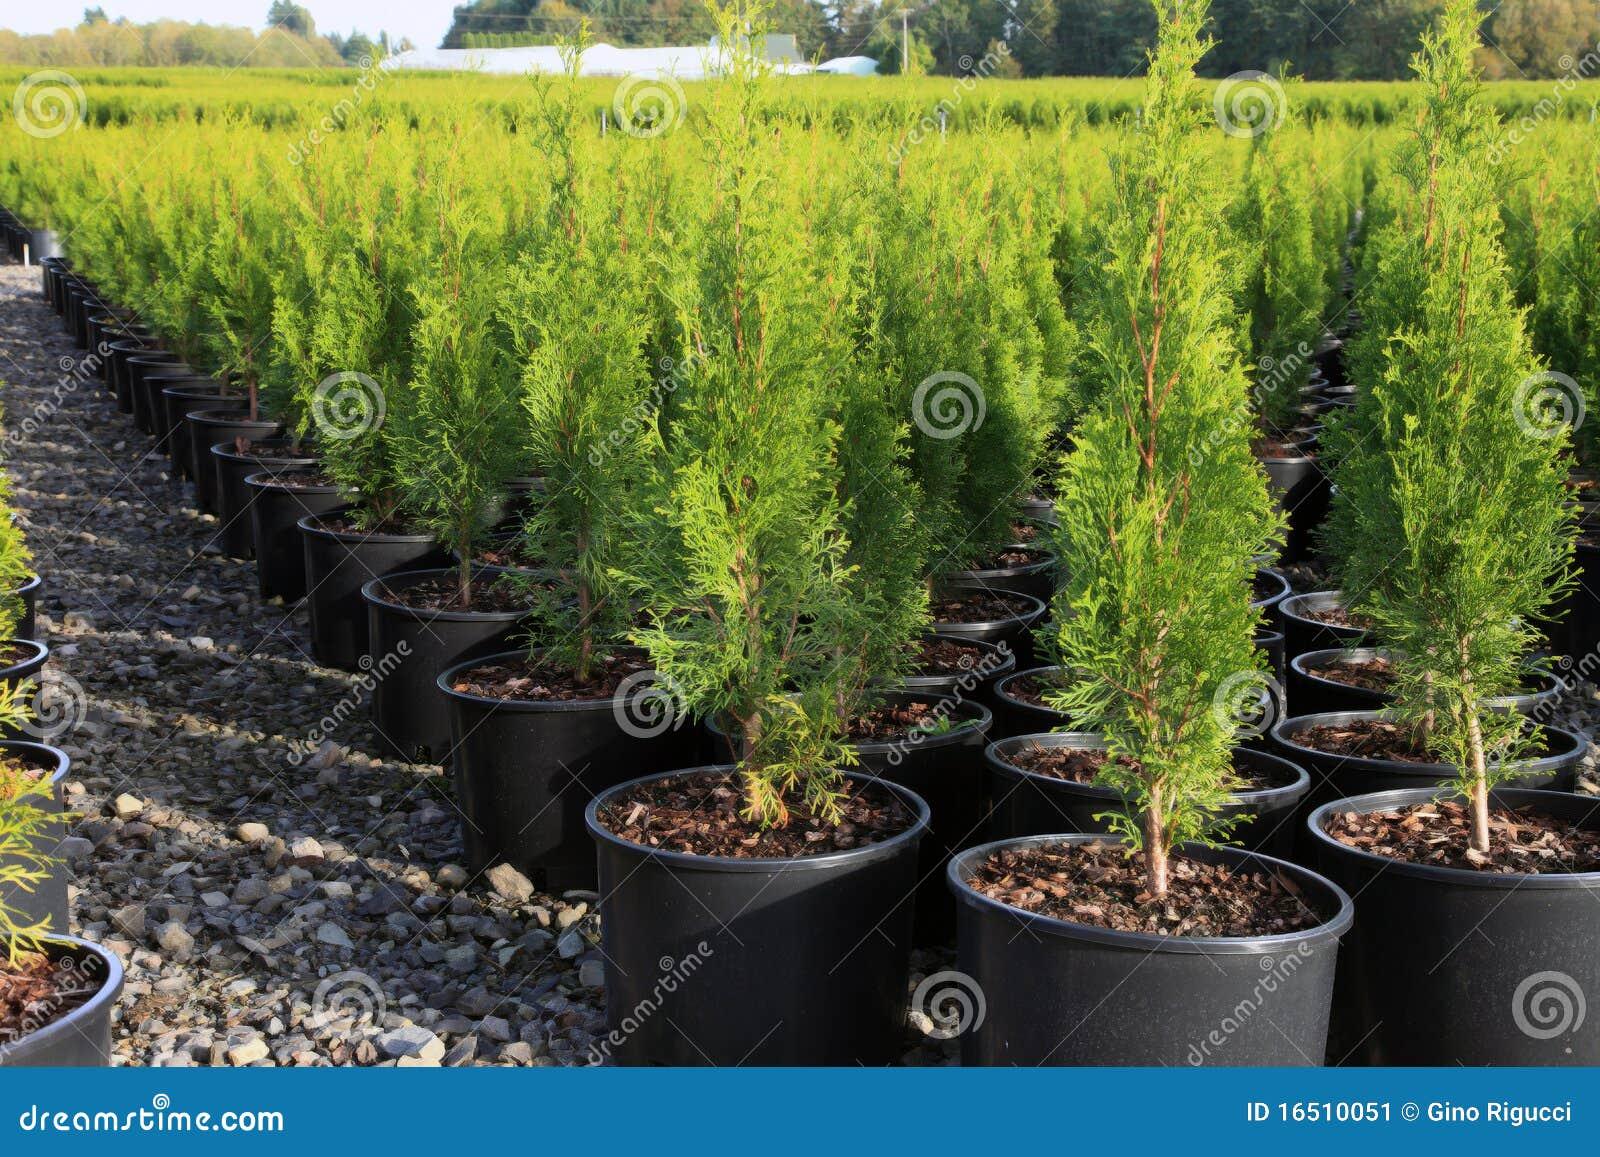 Oregon Nurseries And Seedling Plants Stock Image Image